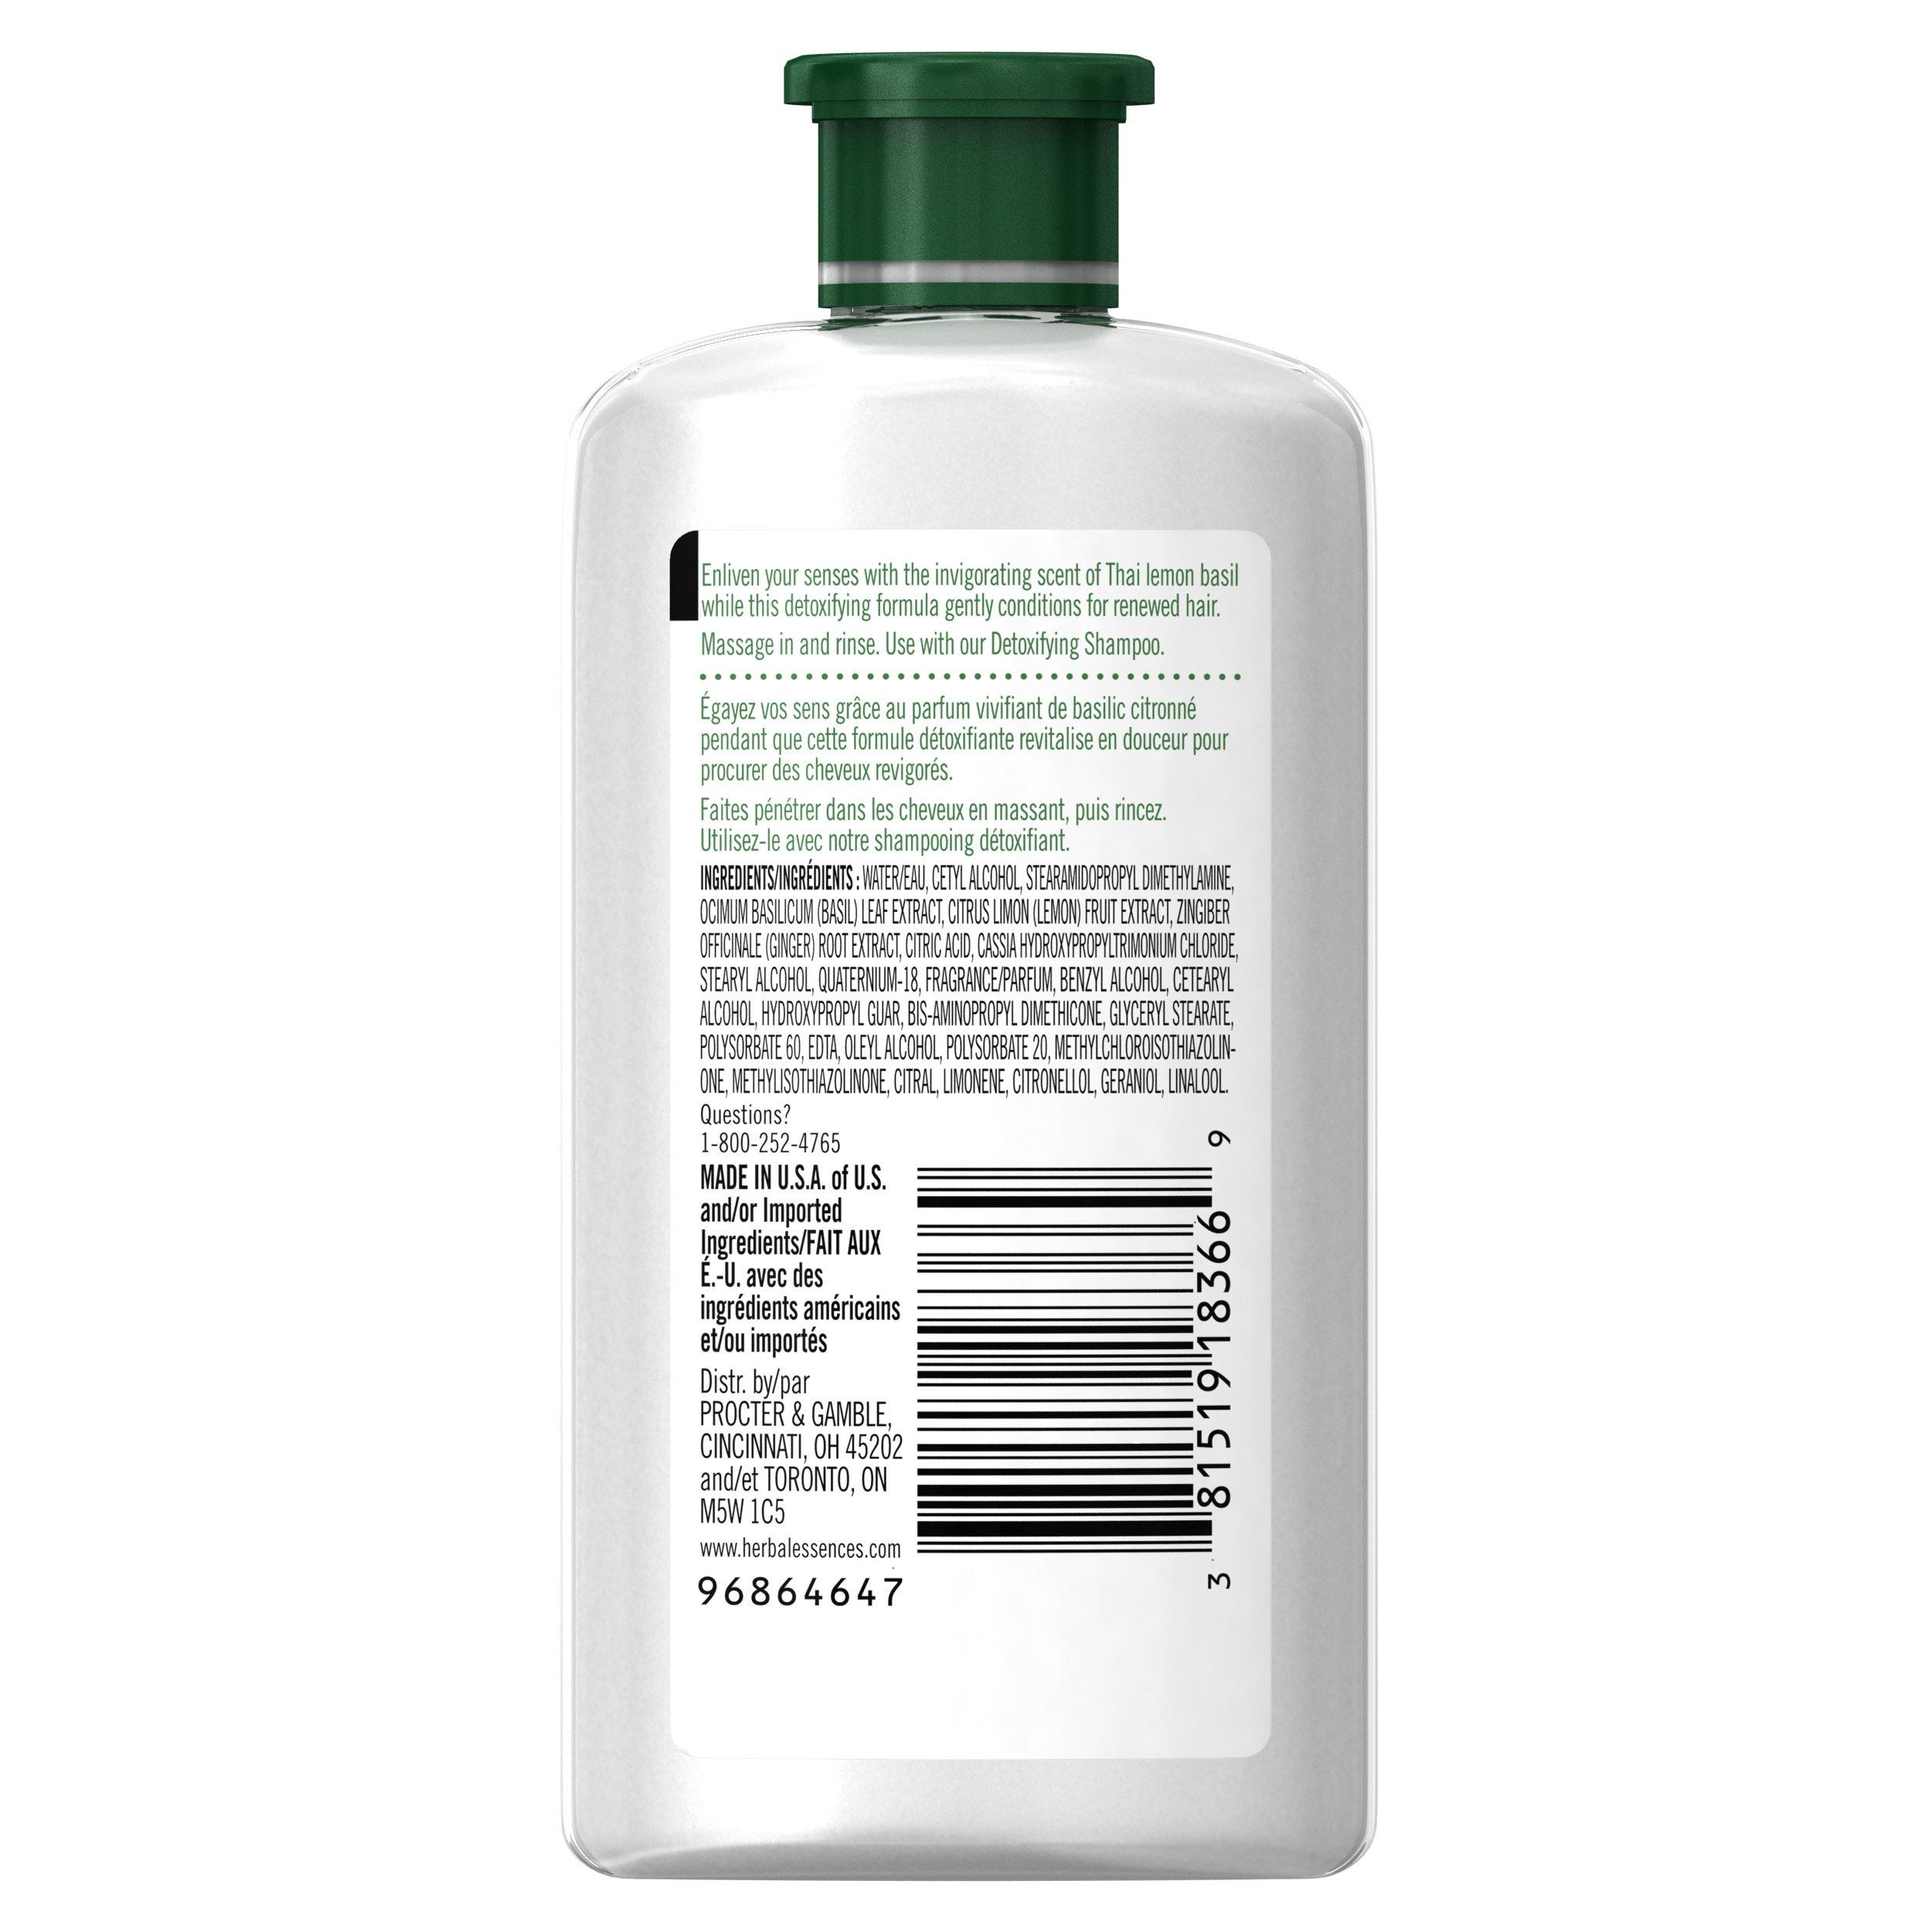 Herbal Essences Wild Naturals Detoxifying Conditioner, 3.38 FL OZ by Herbal Essences (Image #5)